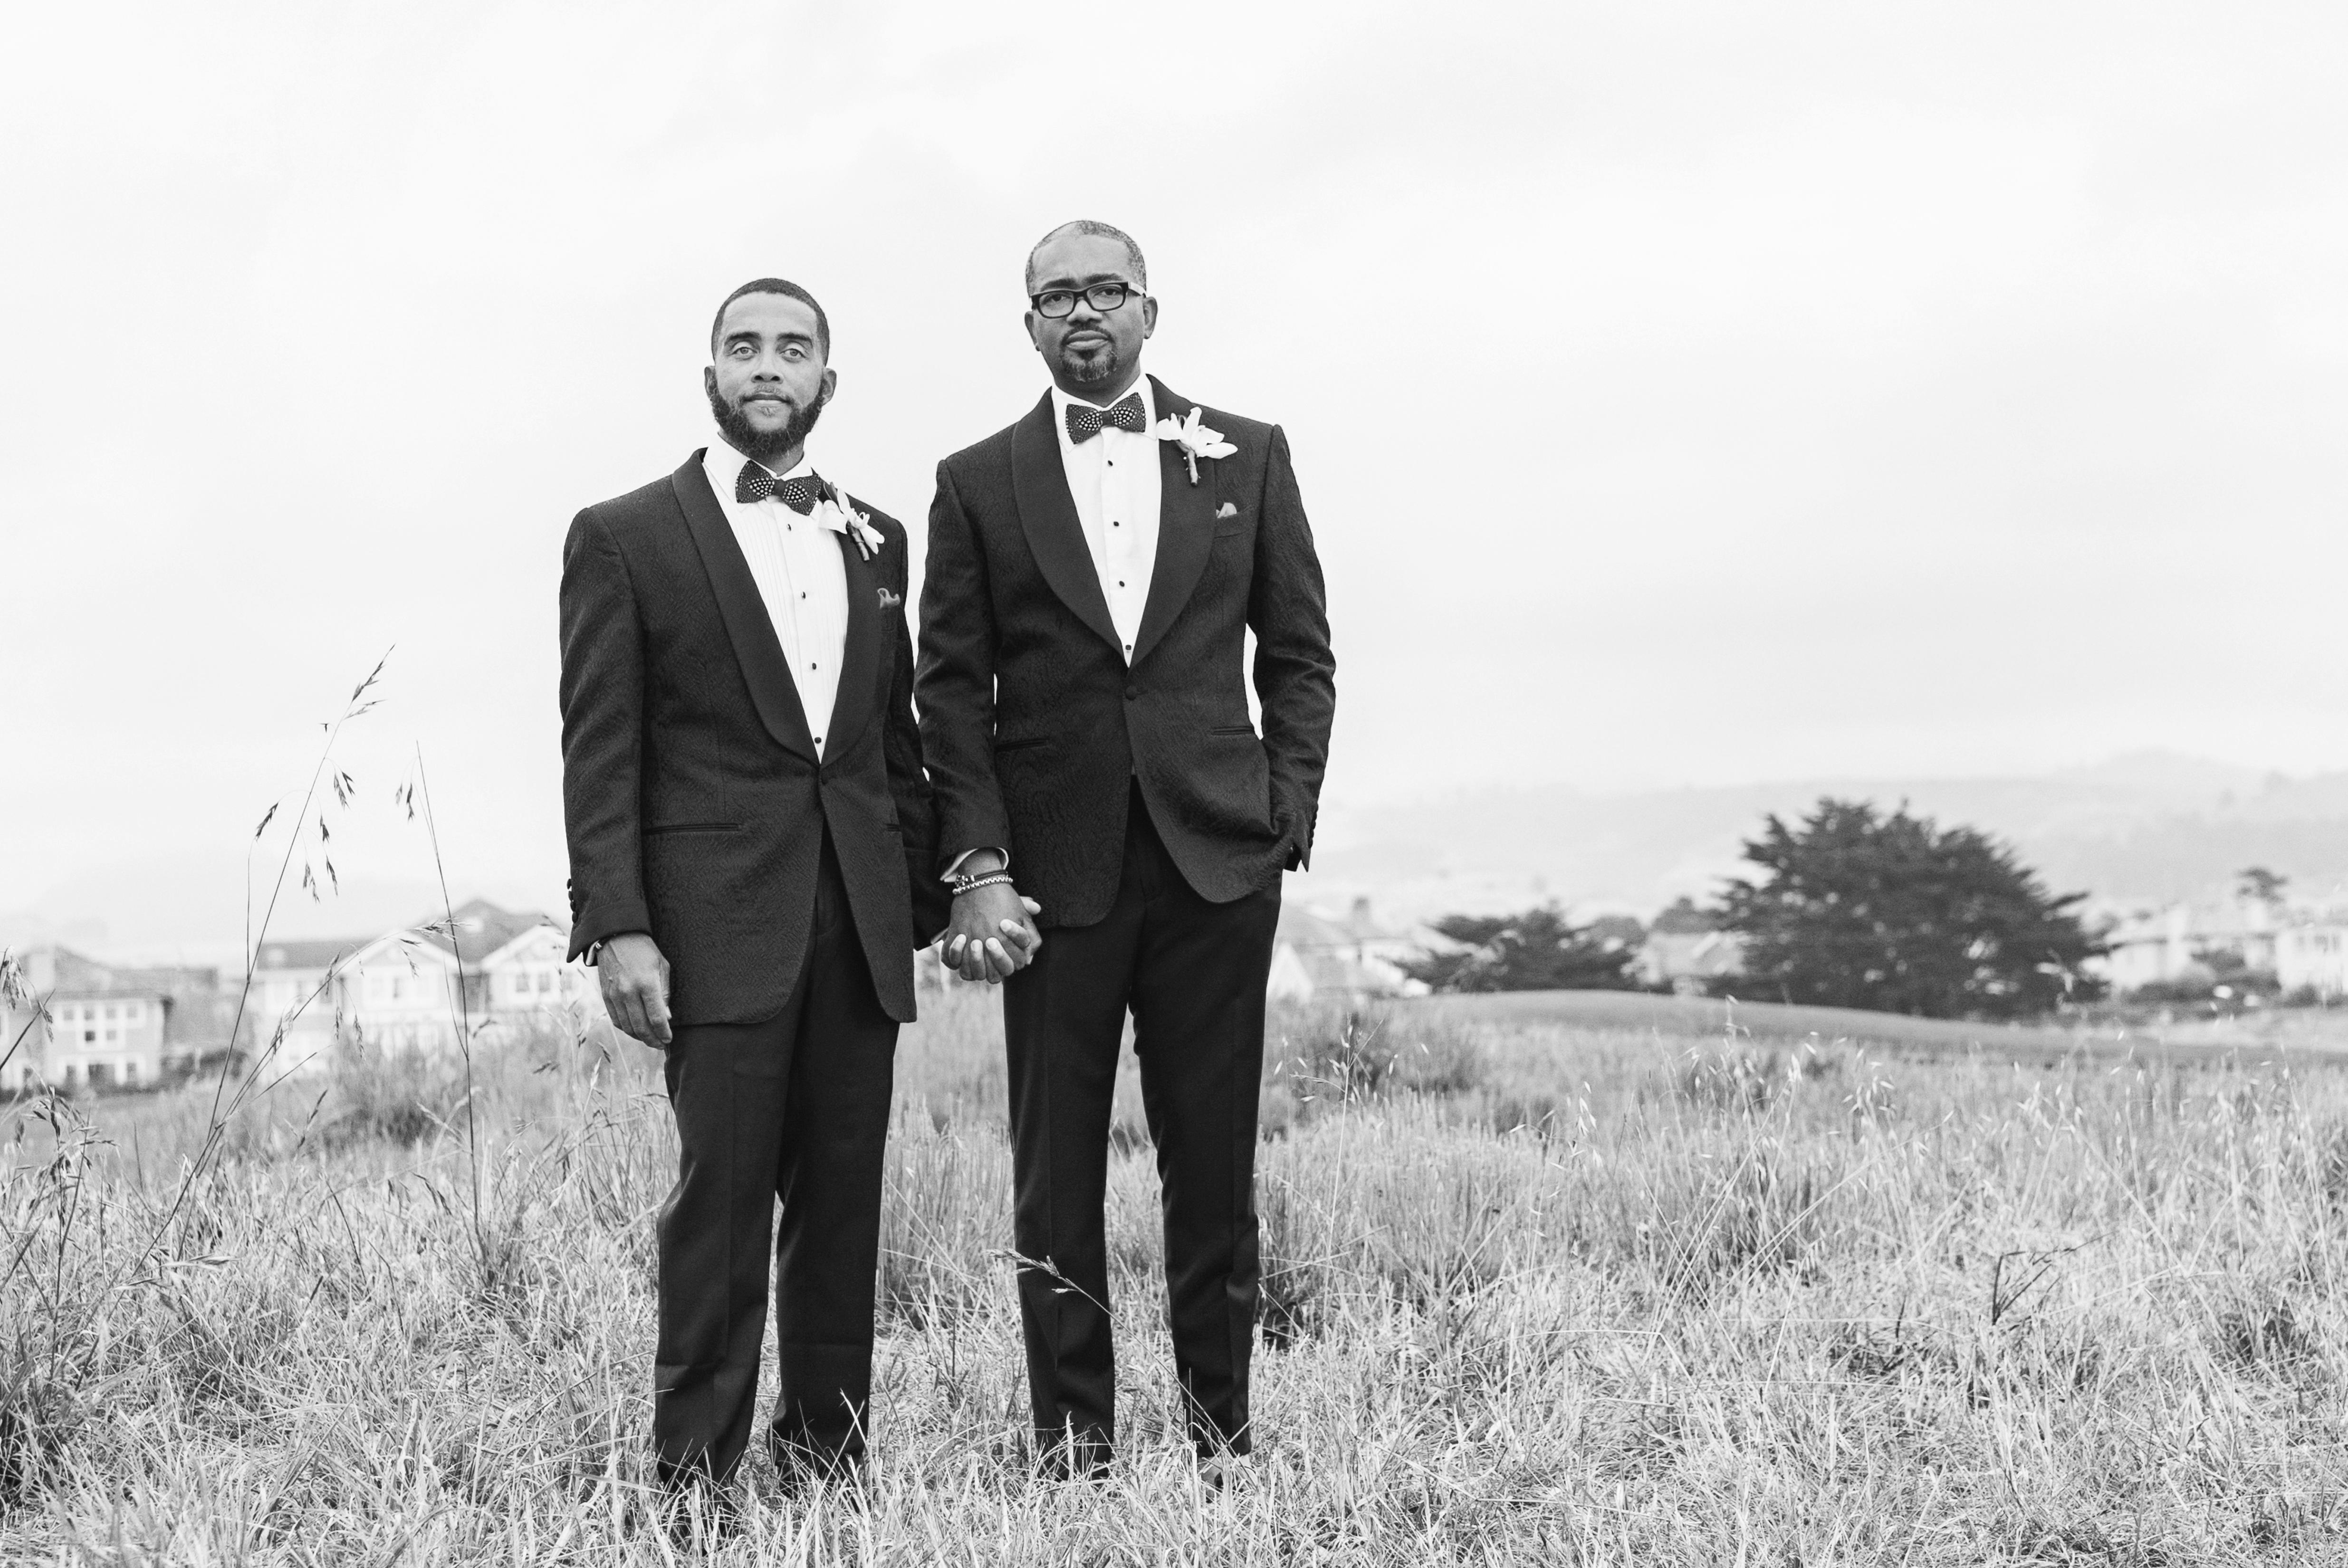 Picturesque Oceanfront Wedding | The Ritz-Carlton, Half Moon Bay - Andrew Weeks Photography